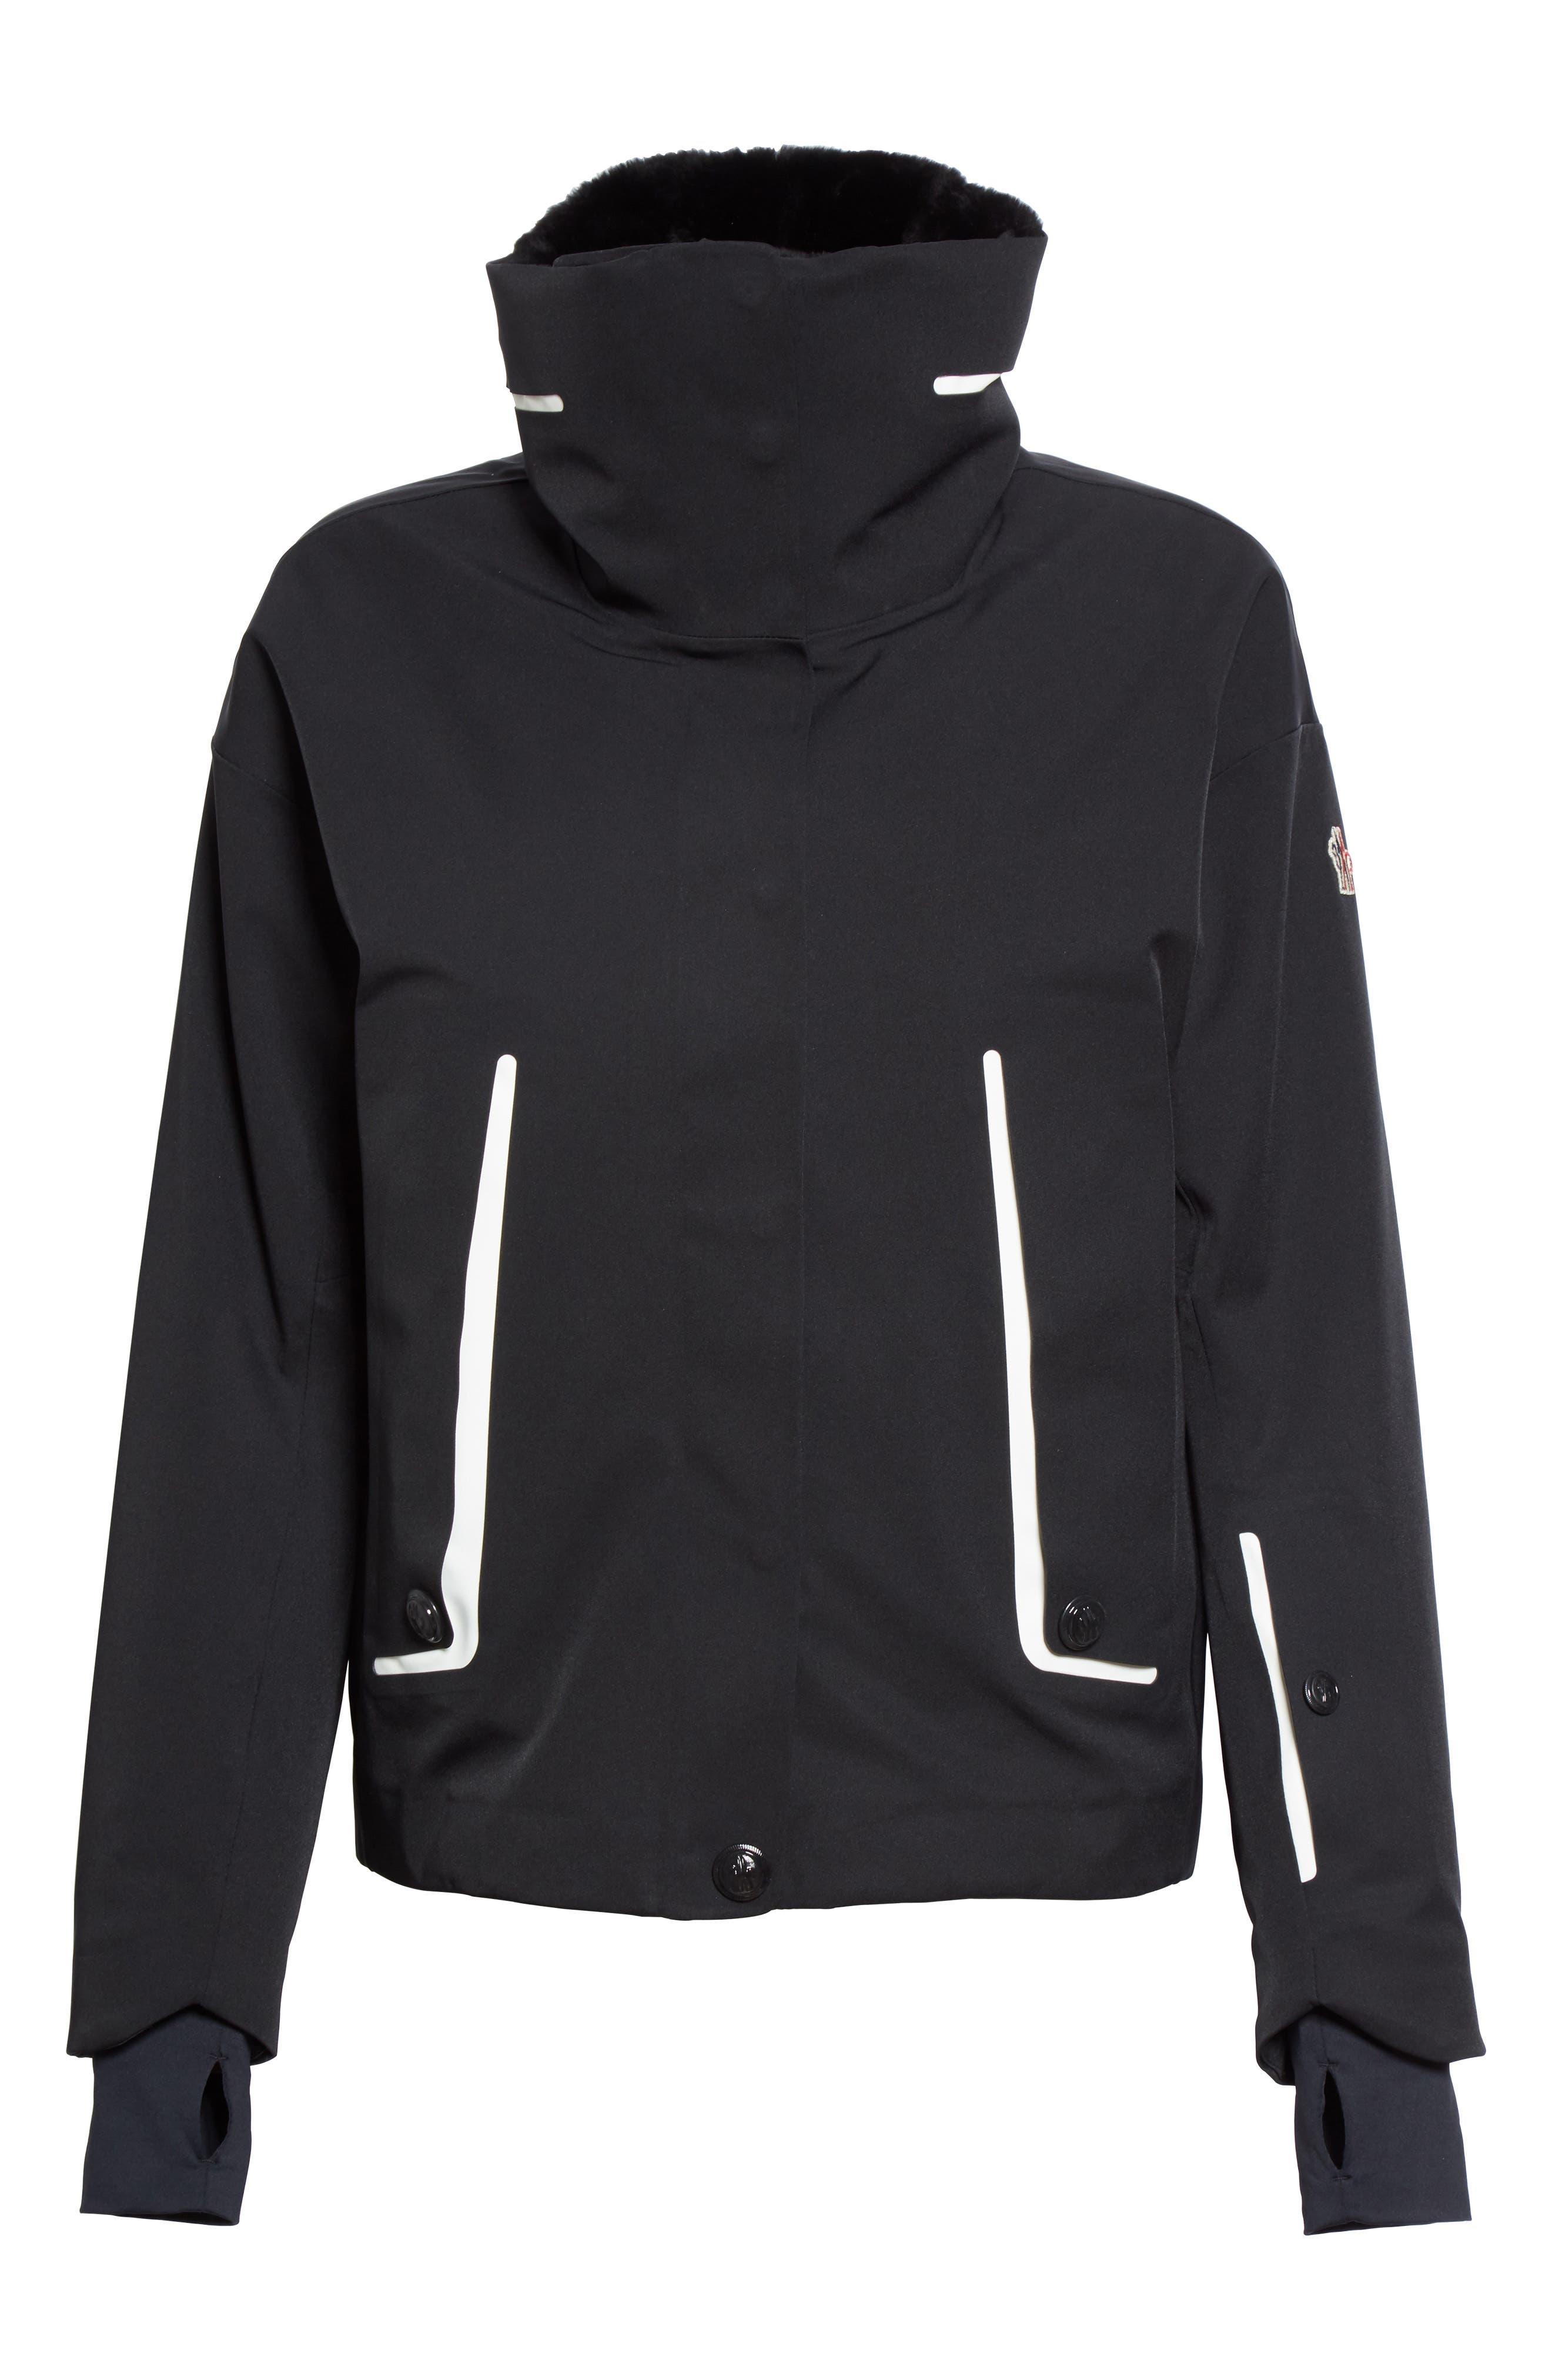 Troisvallees Jacket with Genuine Nutria Fur Collar,                             Alternate thumbnail 6, color,                             Black/ White